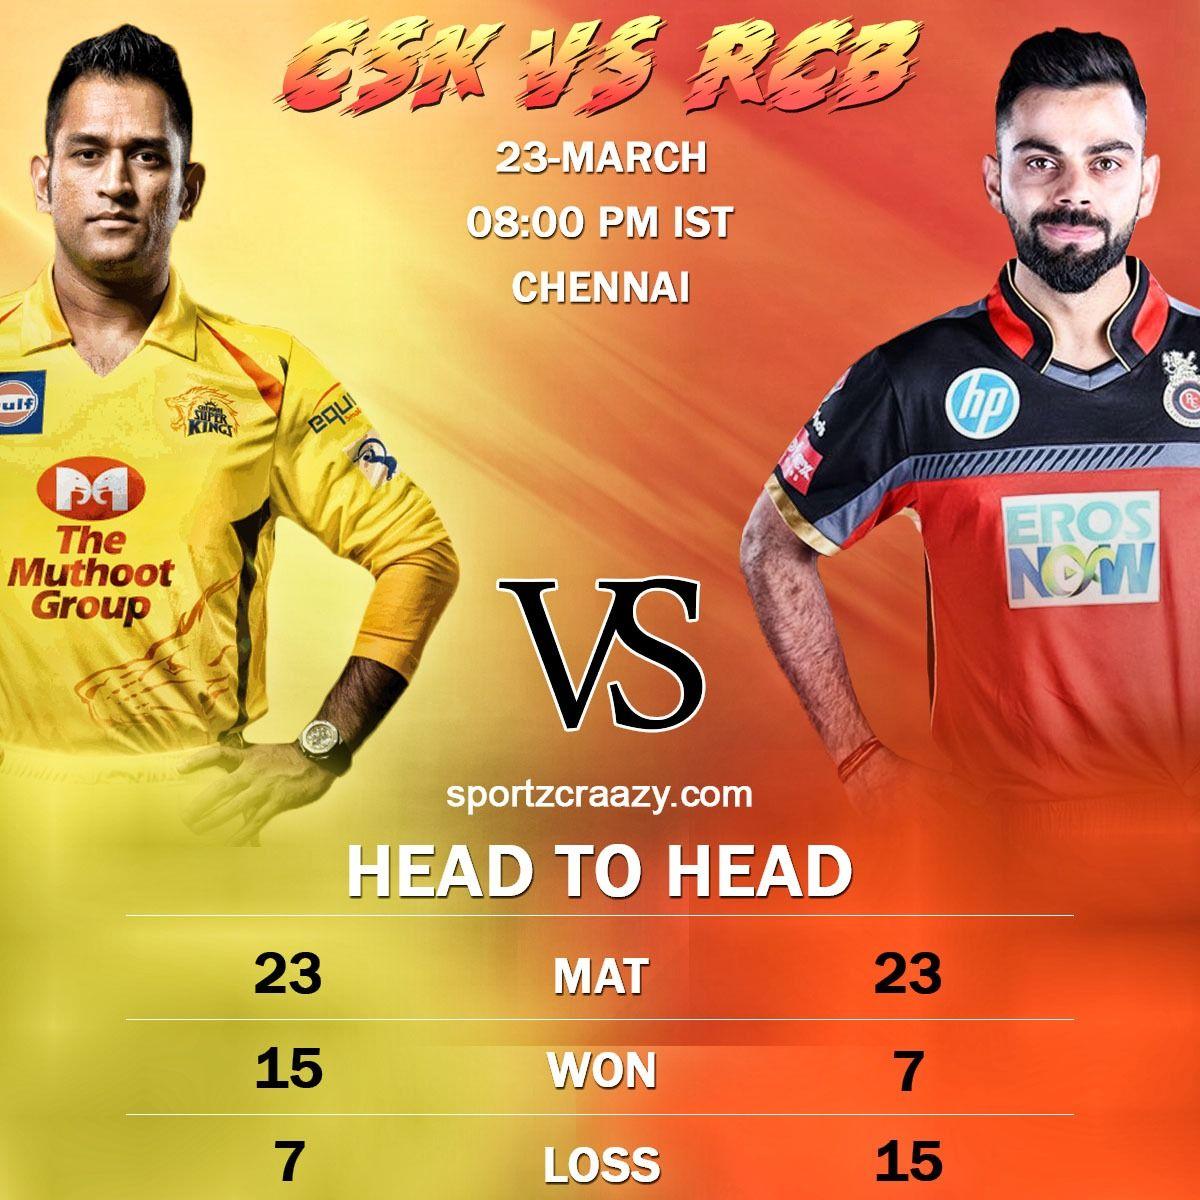 Head To Head Csk Vs Rcb Cricket Quotes Chennai Super Kings Ipl Csk vs rcb hd wallpapers 1080p download